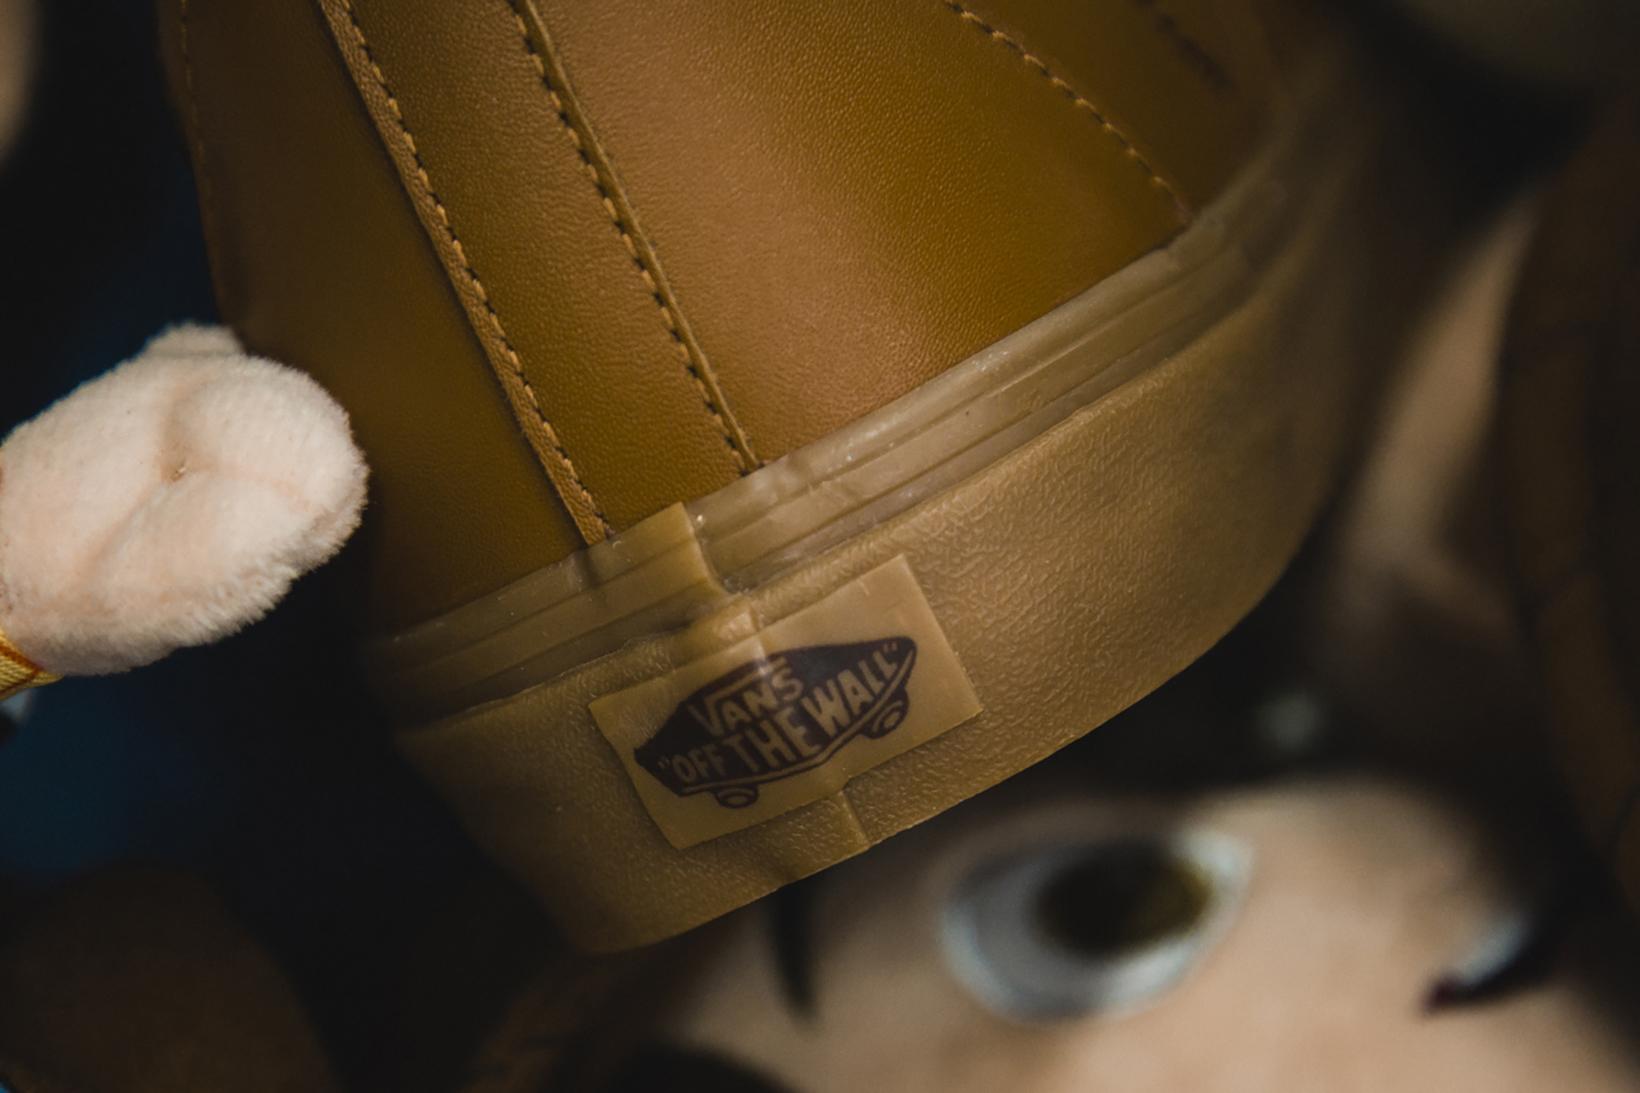 Toy Story Vans Sneakers Woody Buzz Lightyear Disney - 1765031